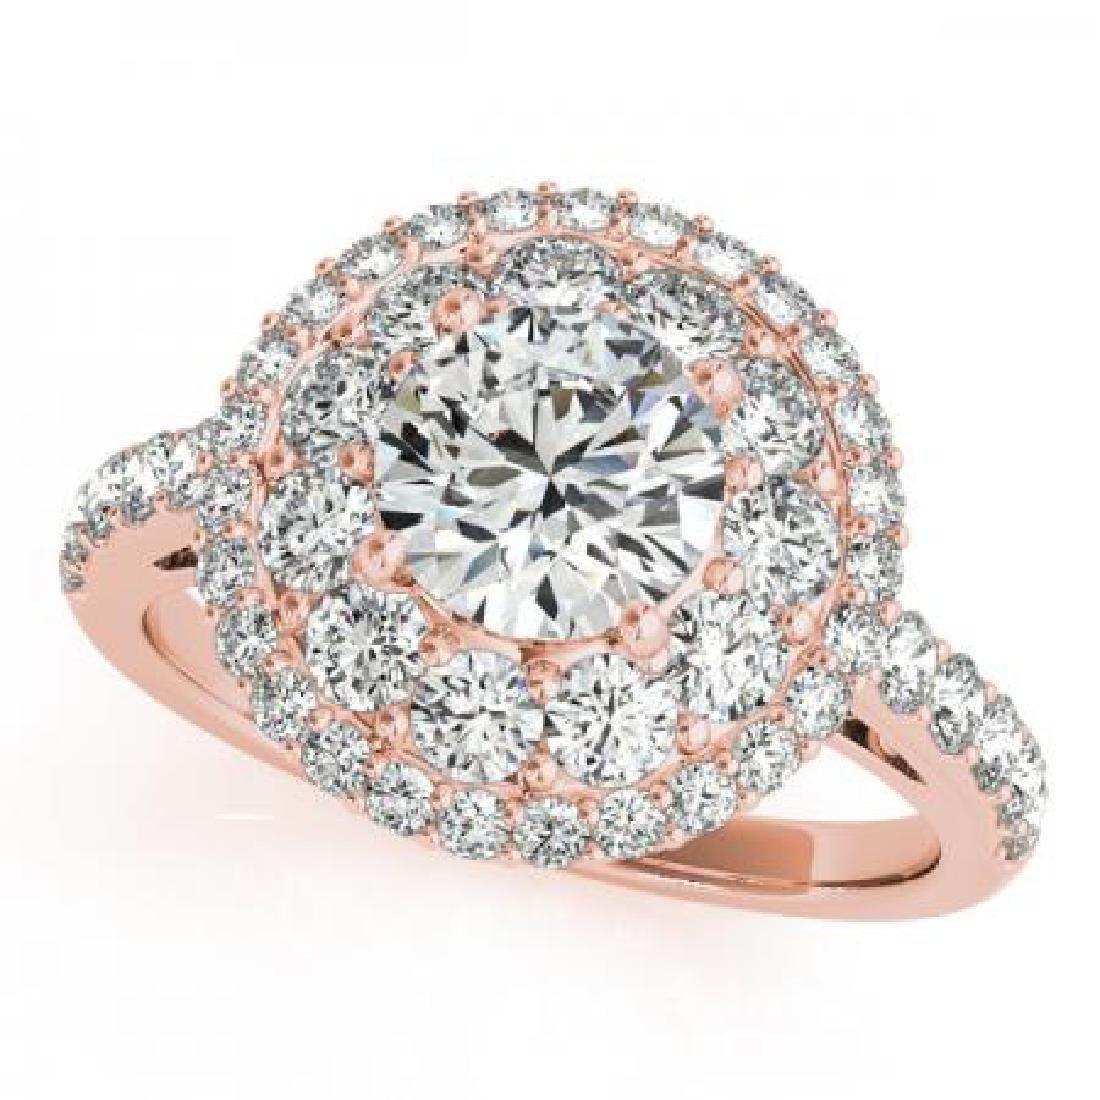 CERTIFIED 18K ROSE GOLD 1.34 CT G-H/VS-SI1 DIAMOND HALO